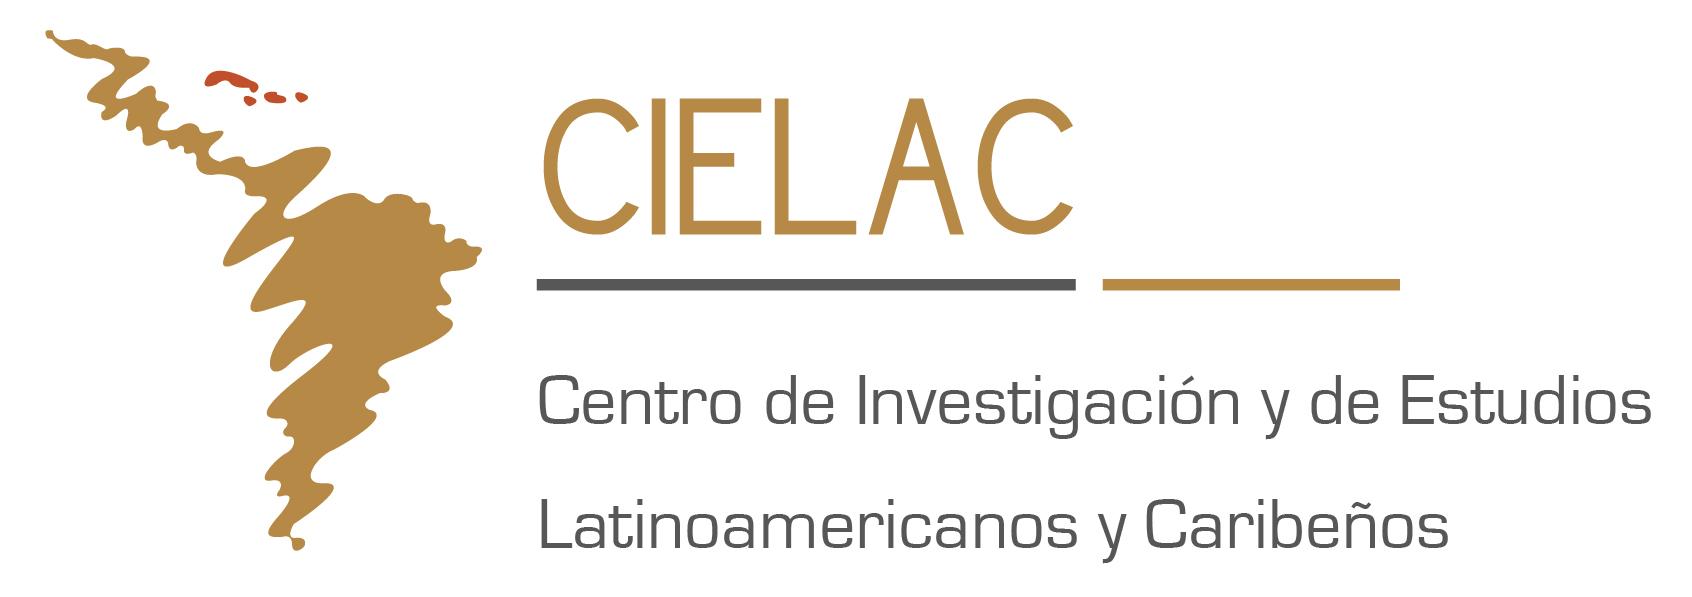 Imaginario e identidad del pensamiento latinoamericano